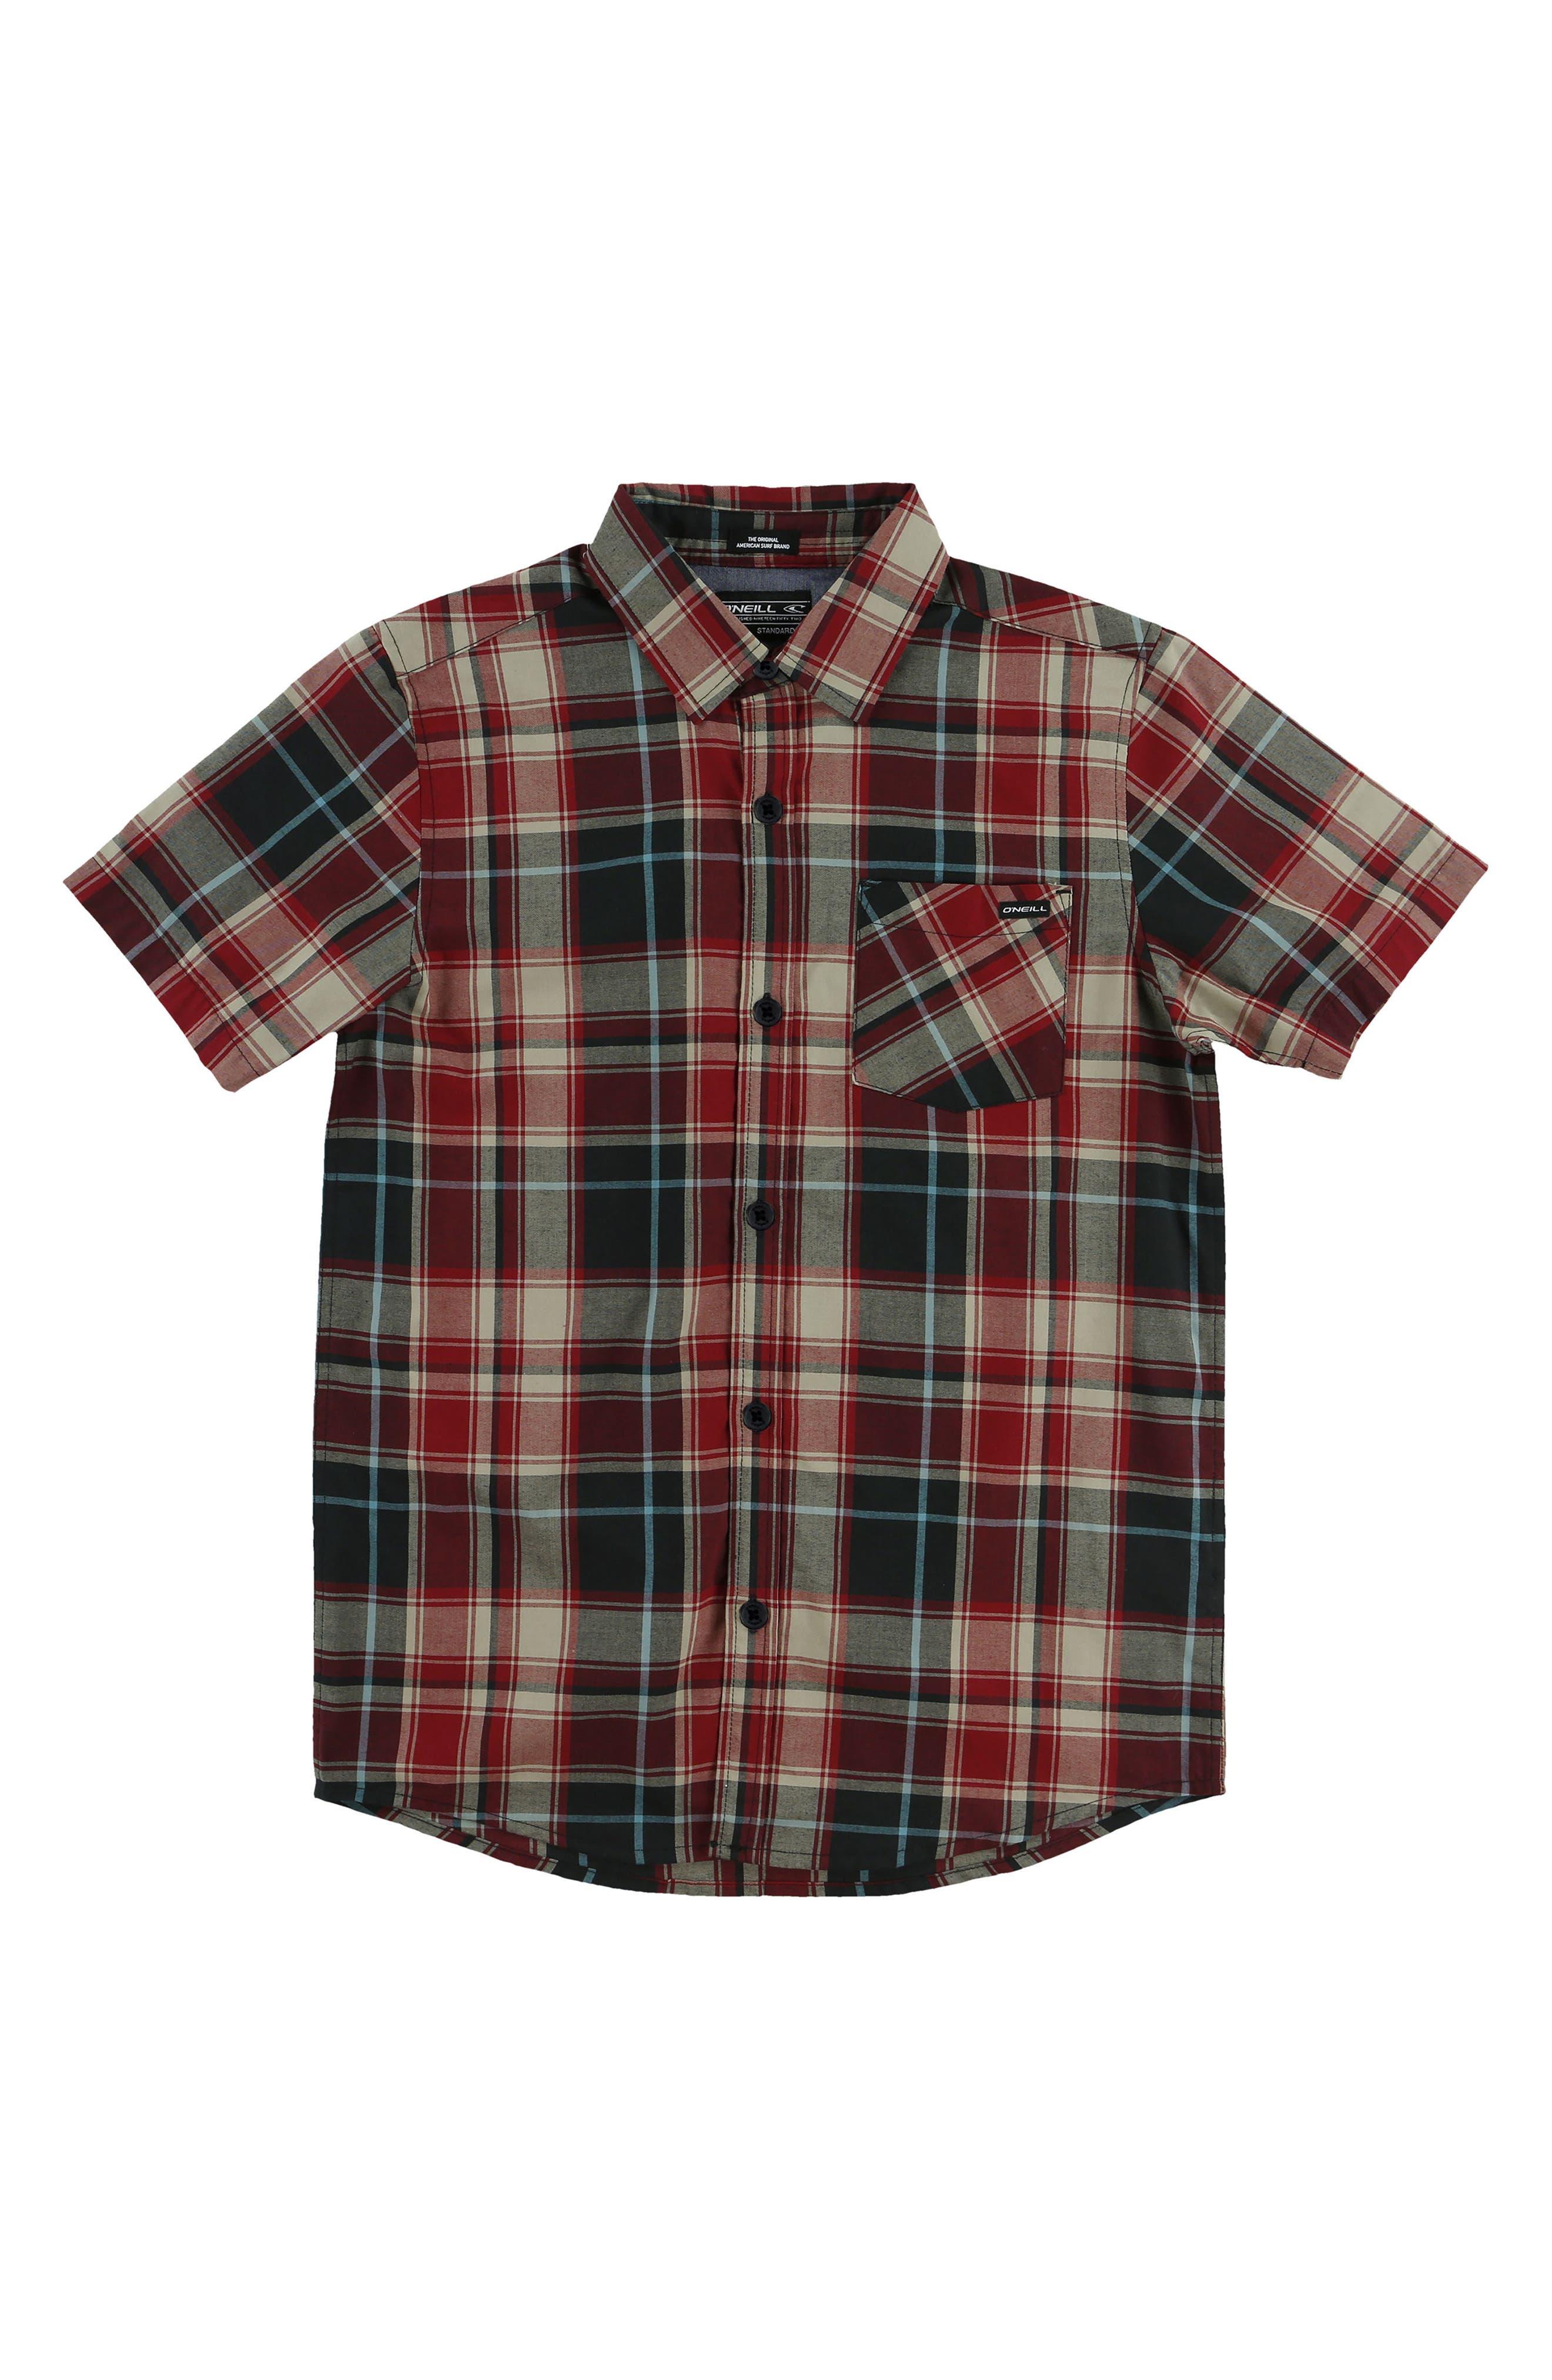 Alternate Image 1 Selected - O'Neill Plaid Short Sleeve Shirt (Big Boys)